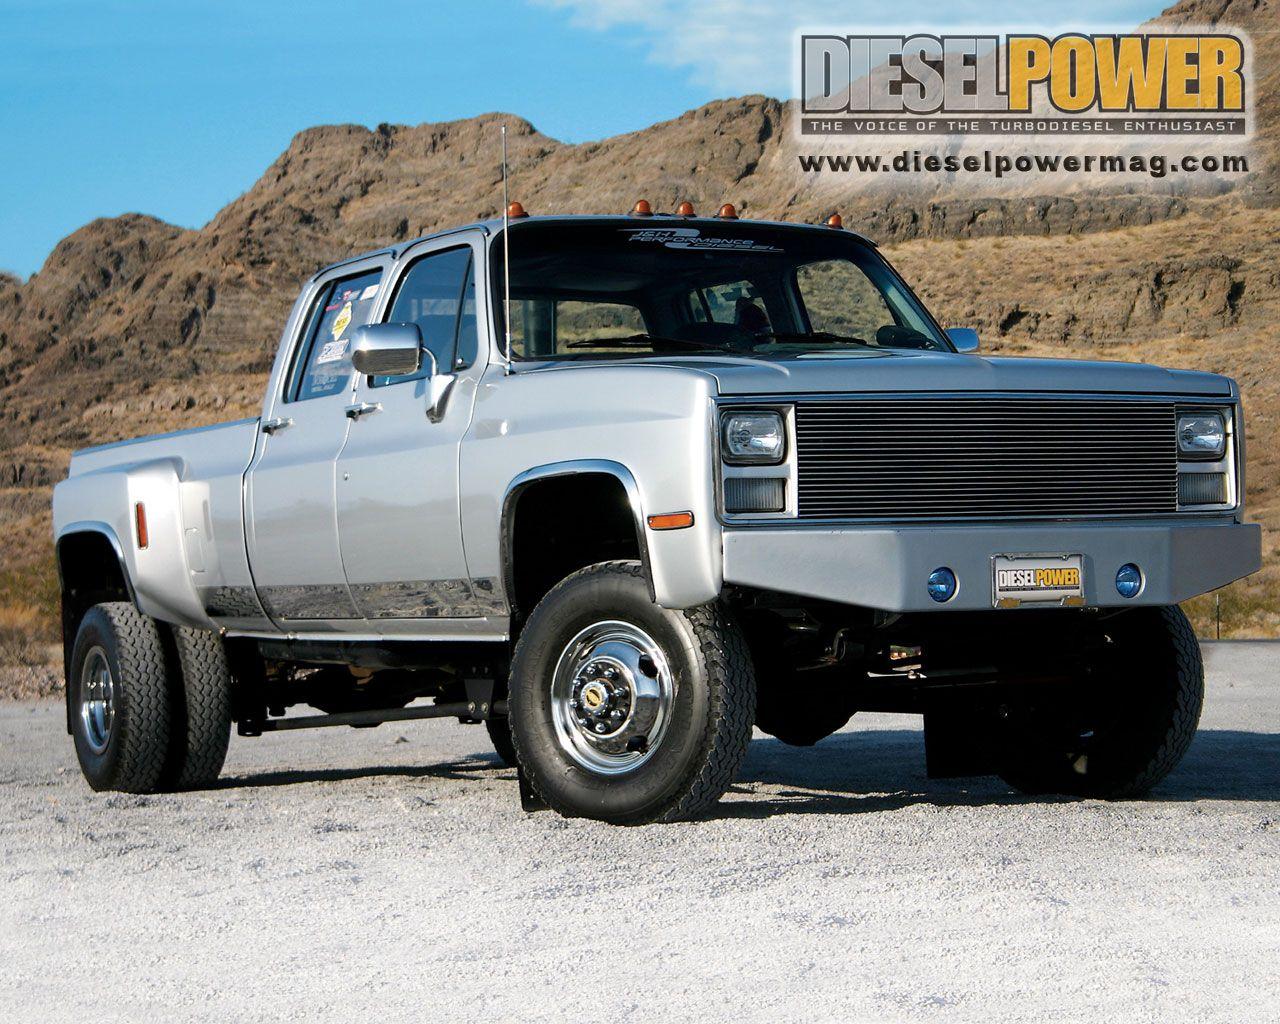 1980 chevy silverado dually 4x4 6 6l duramax diesel 6 speed manual trans 31 to 33 tires [ 1280 x 1024 Pixel ]